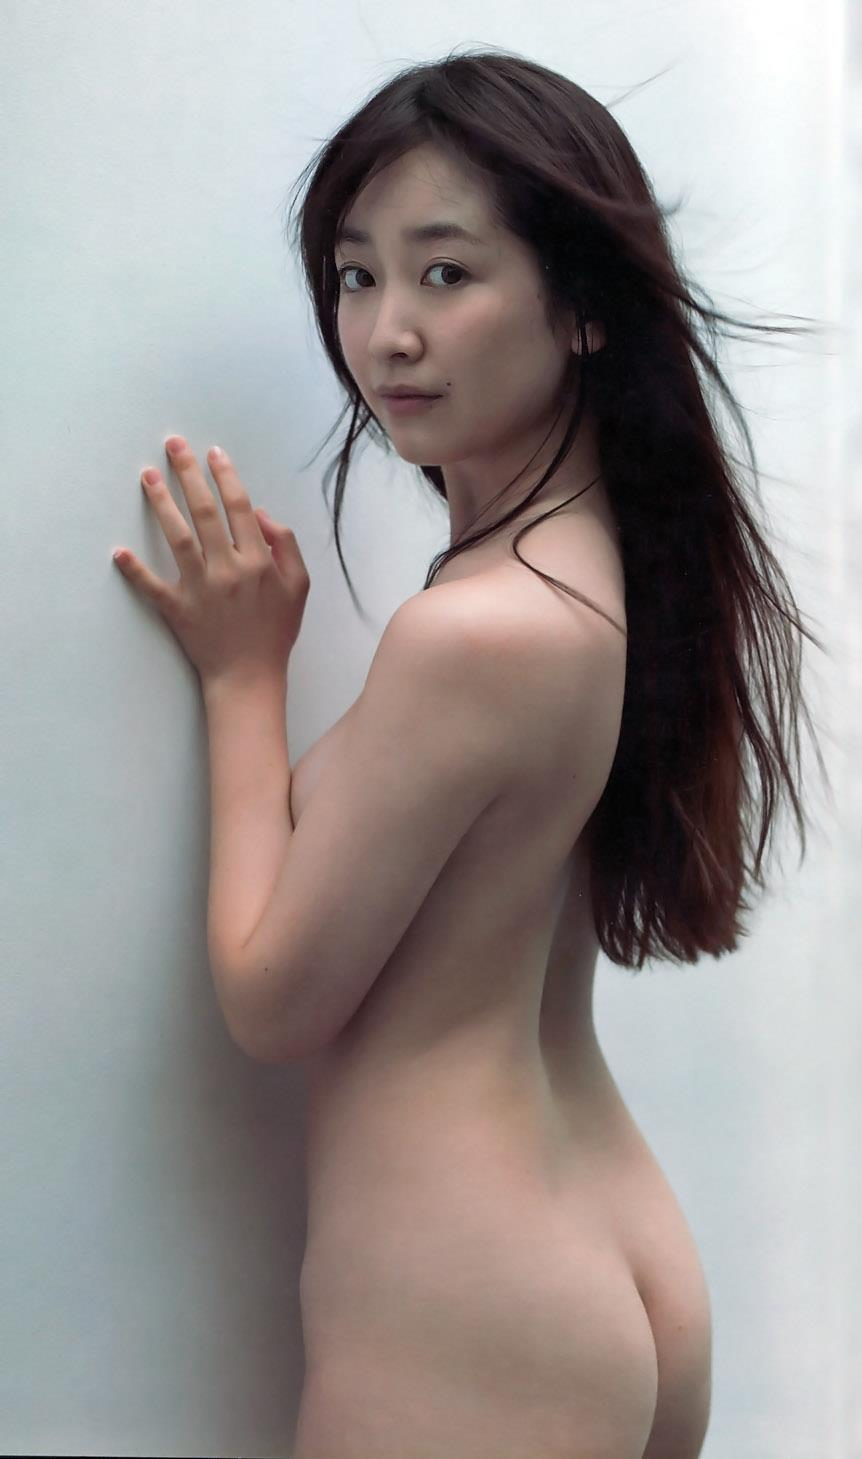 石橋杏奈 ★ Part.5 [無断転載禁止]©bbspink.comYouTube動画>19本 ->画像>1285枚